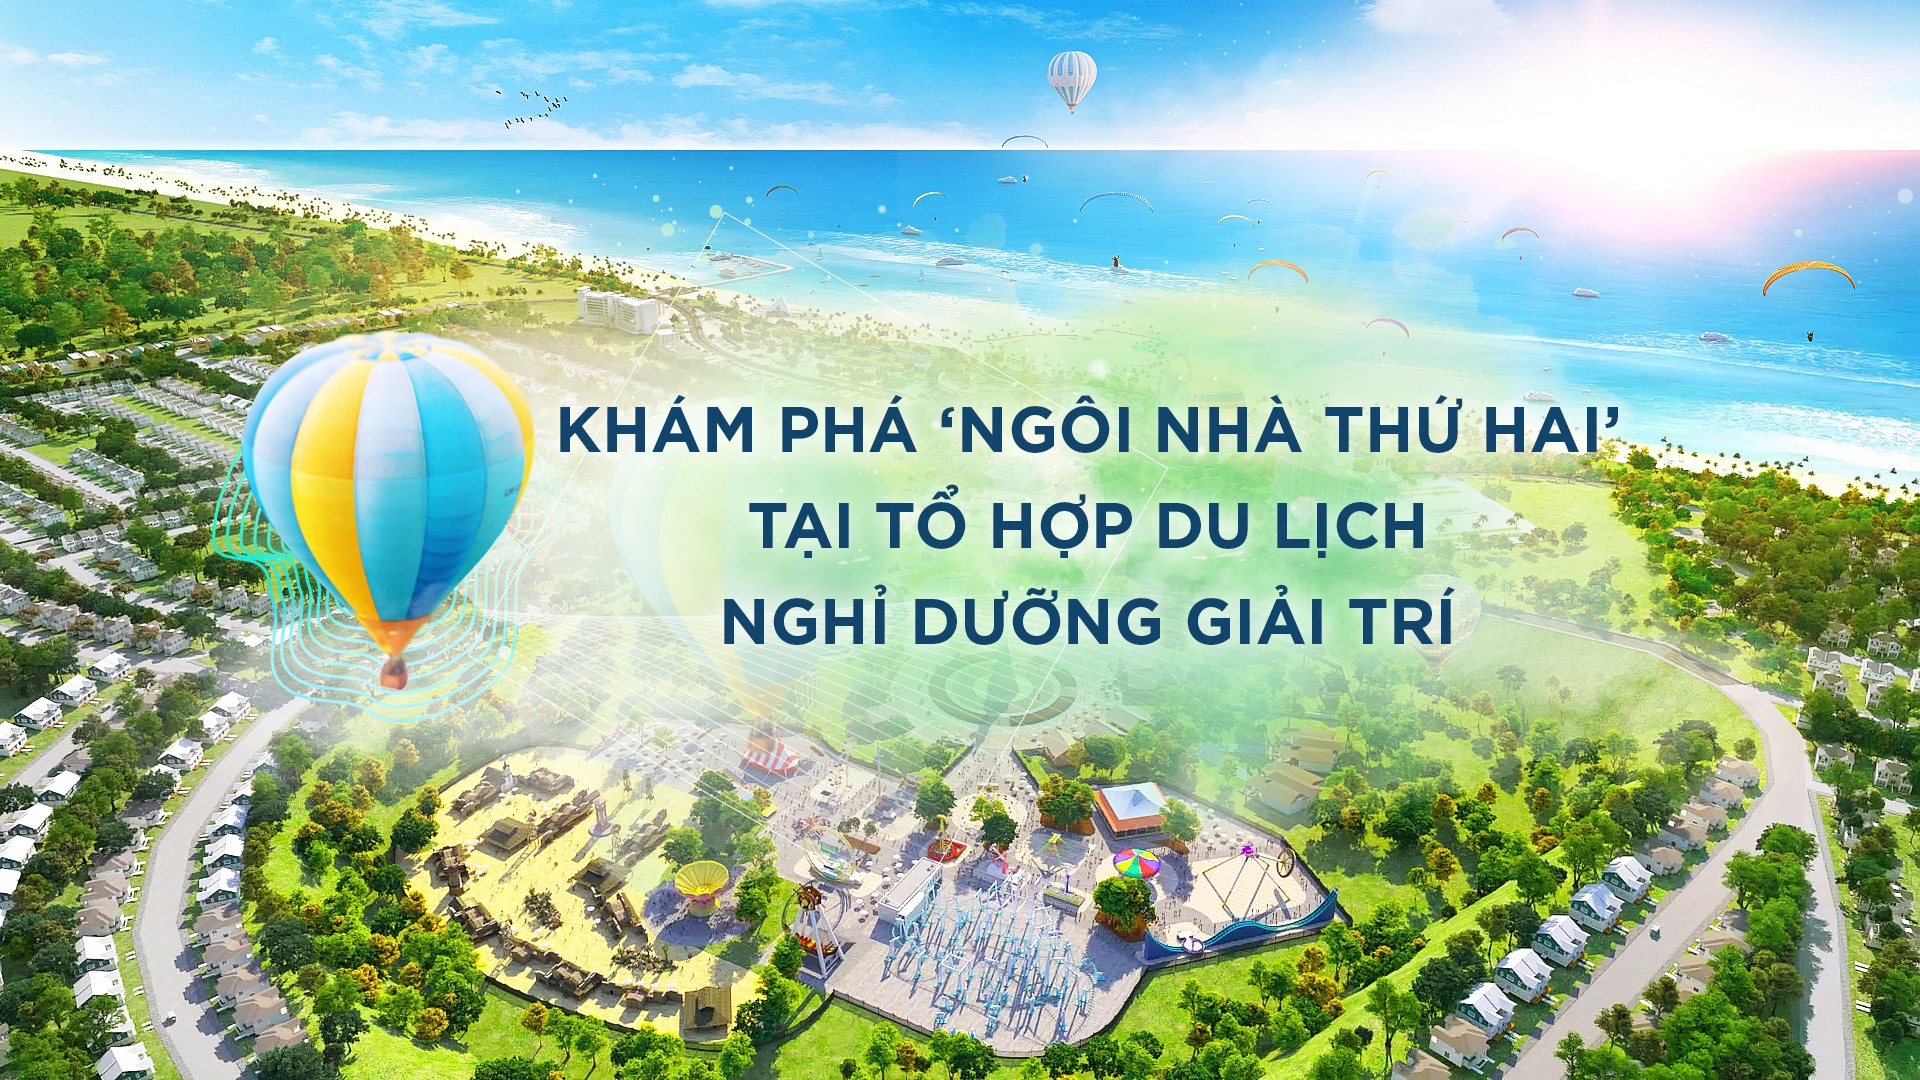 Kham pha 'ngoi nha thu hai' tai to hop du lich nghi duong giai tri hinh anh 1